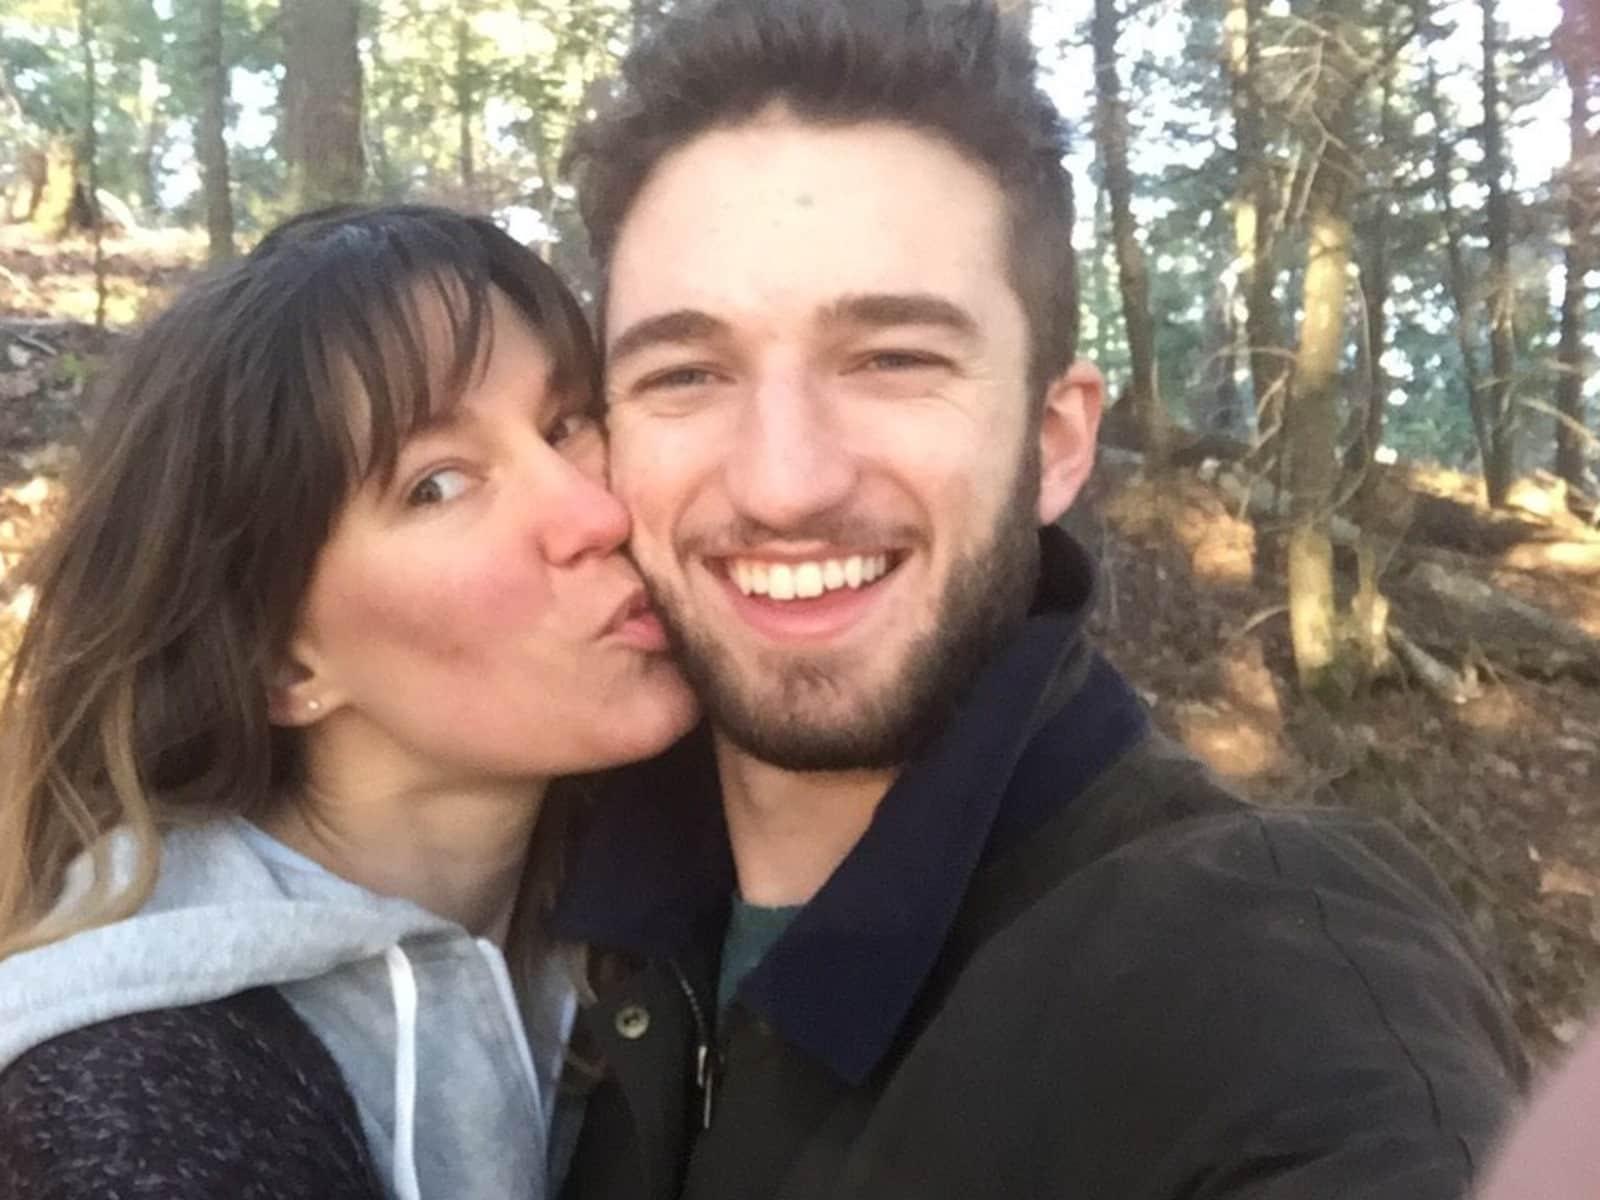 Aimee & Brendan from Ottawa, Ontario, Canada